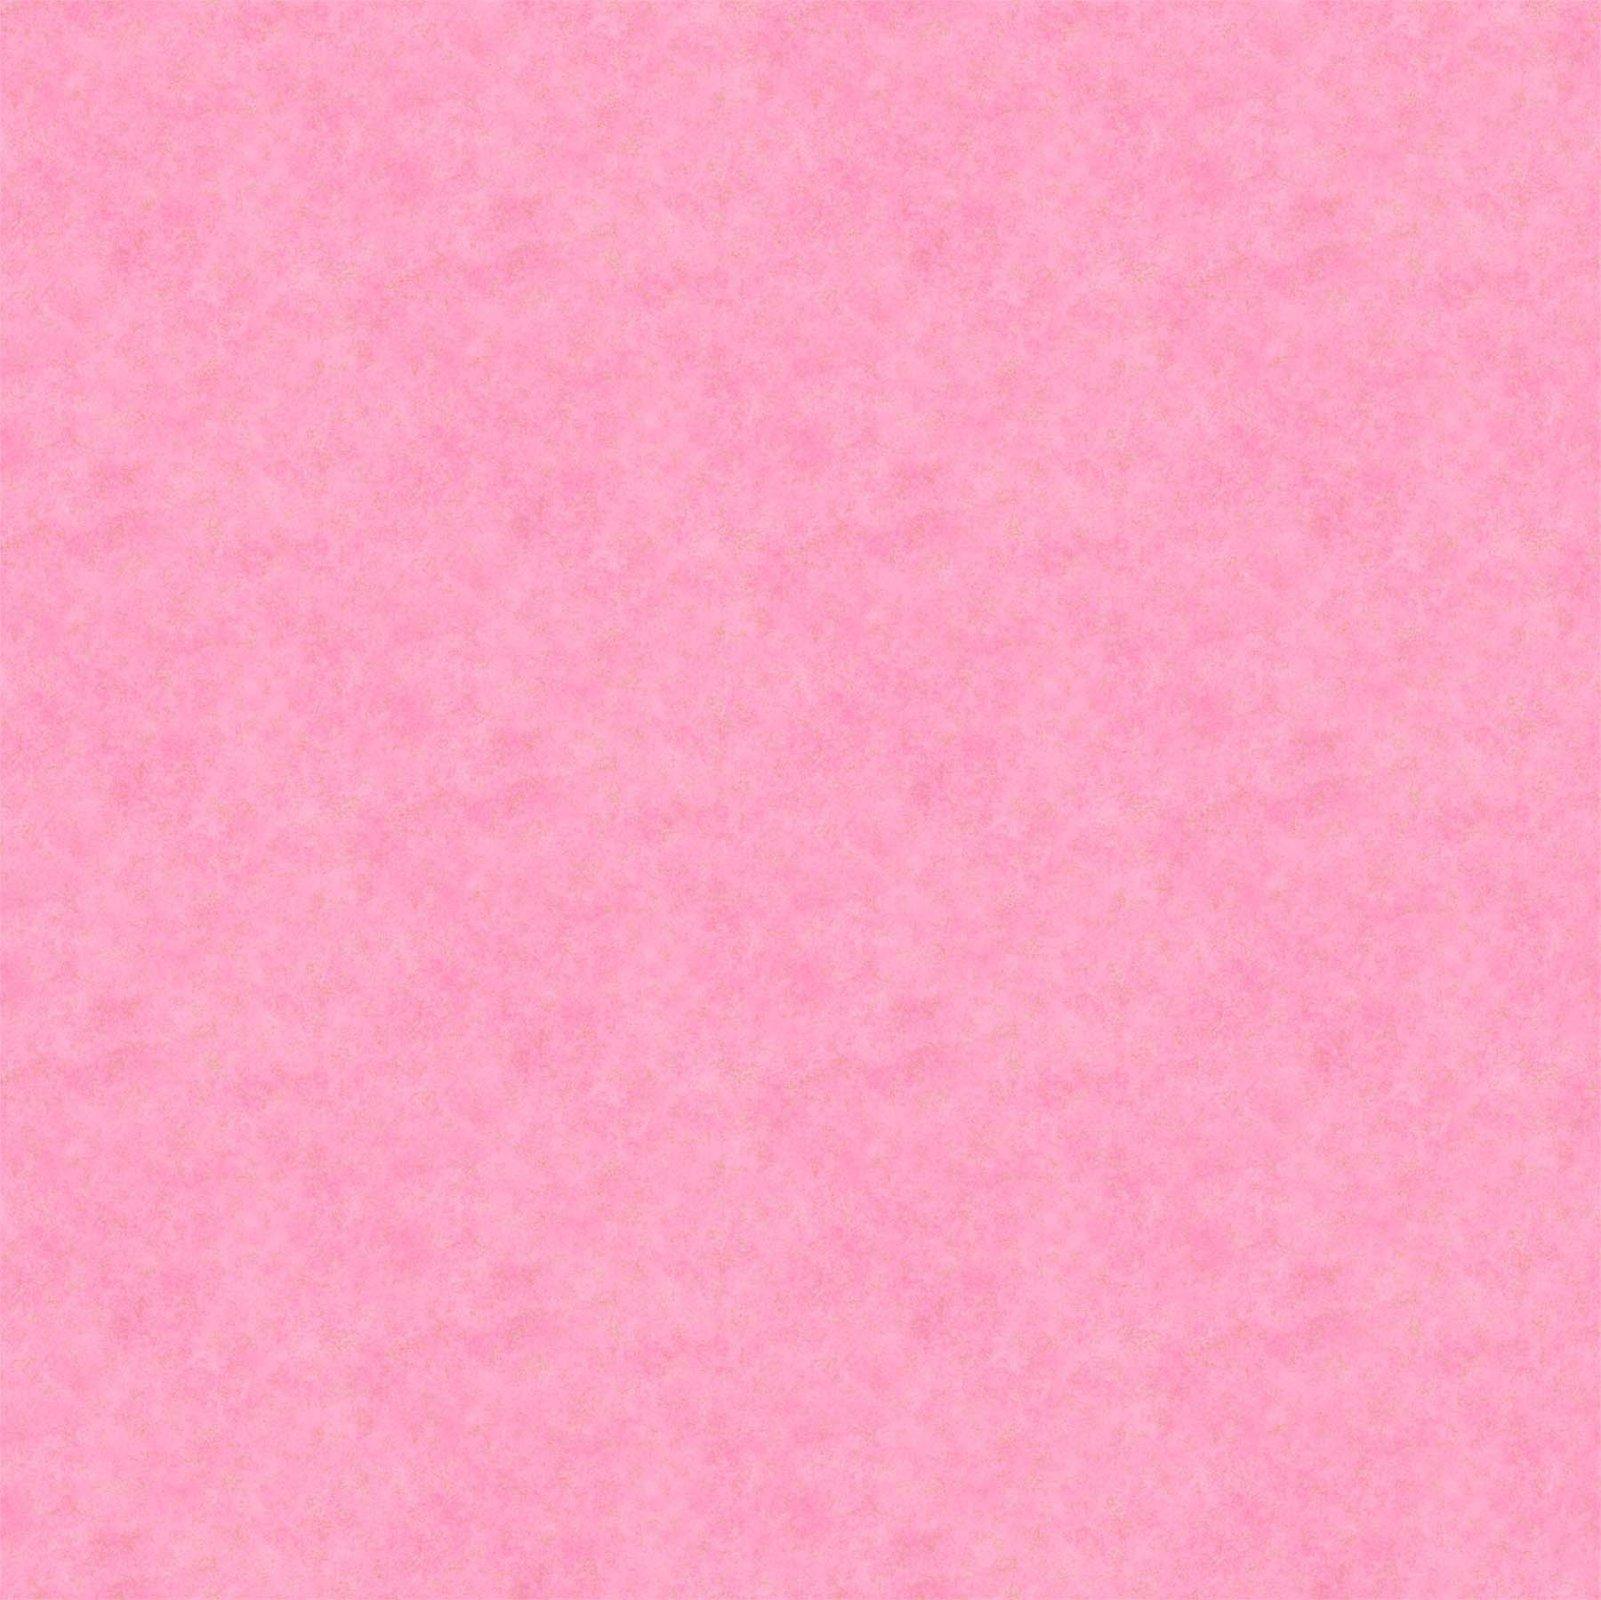 Shimmer - Radiance - Bubblegum